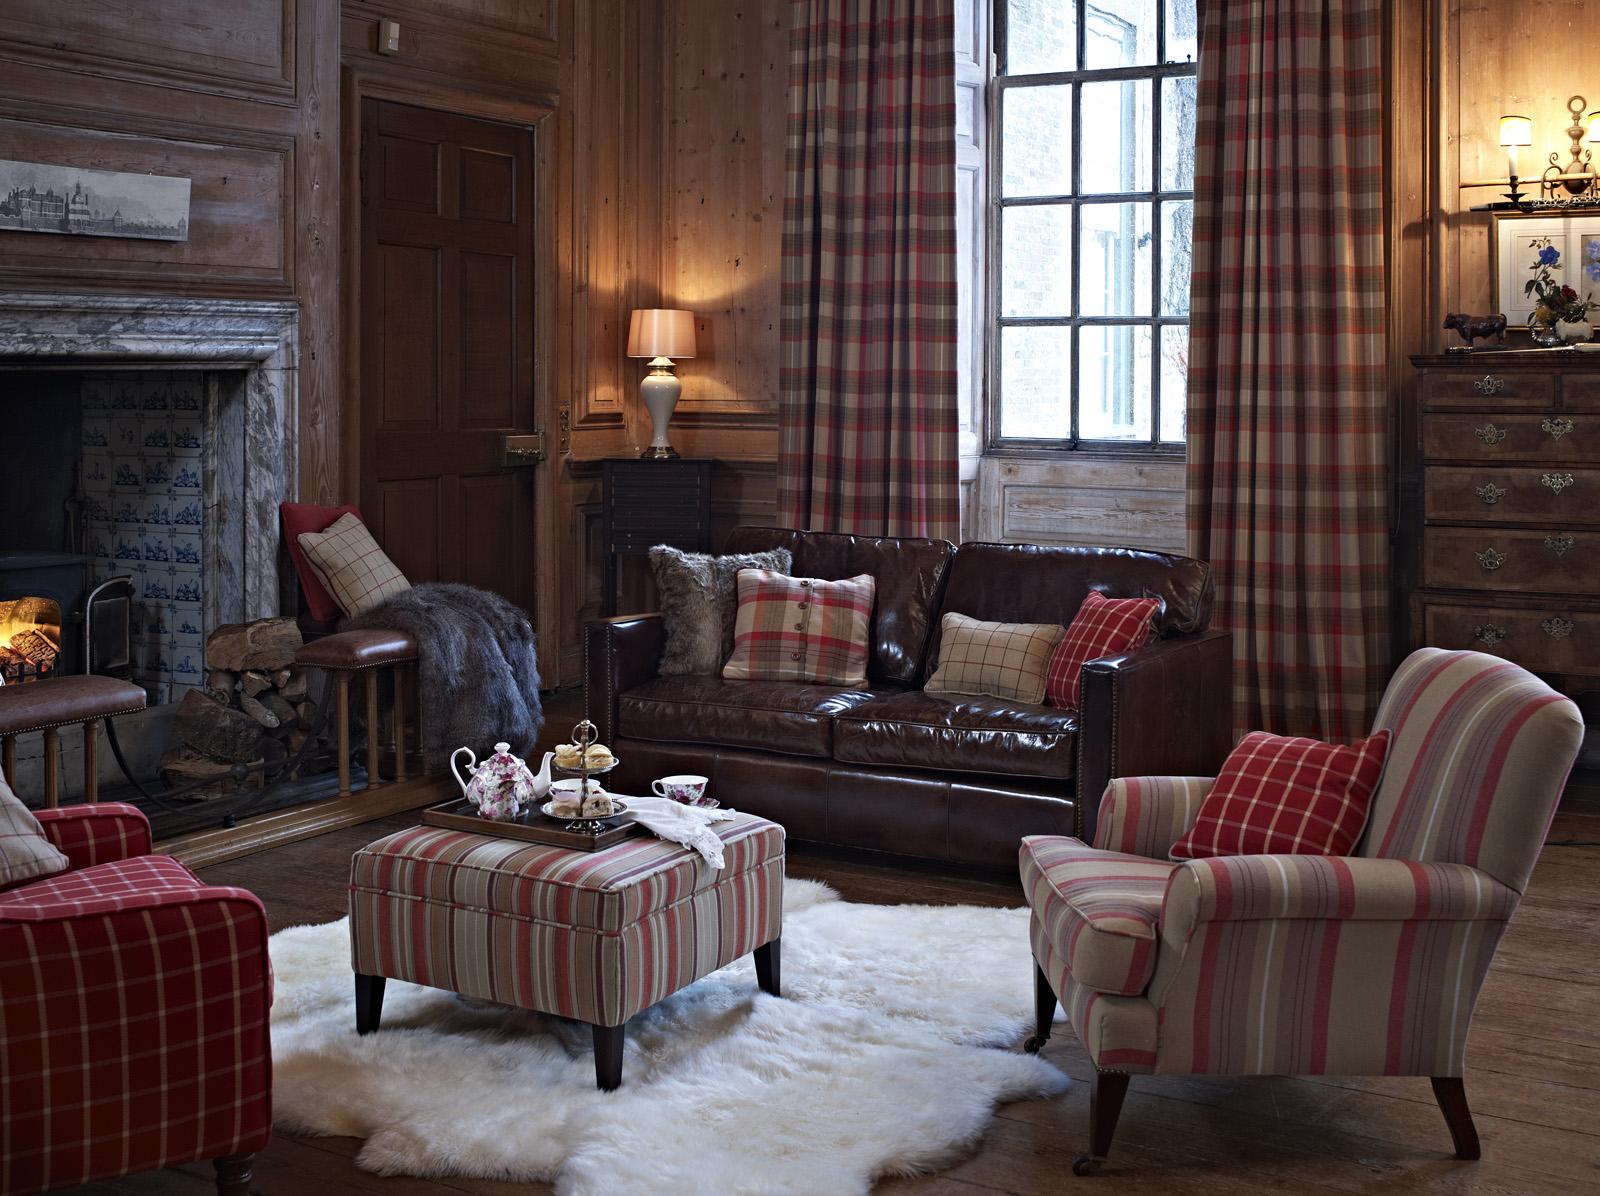 Made To Measure Curtains Prestigious Textiles Highland